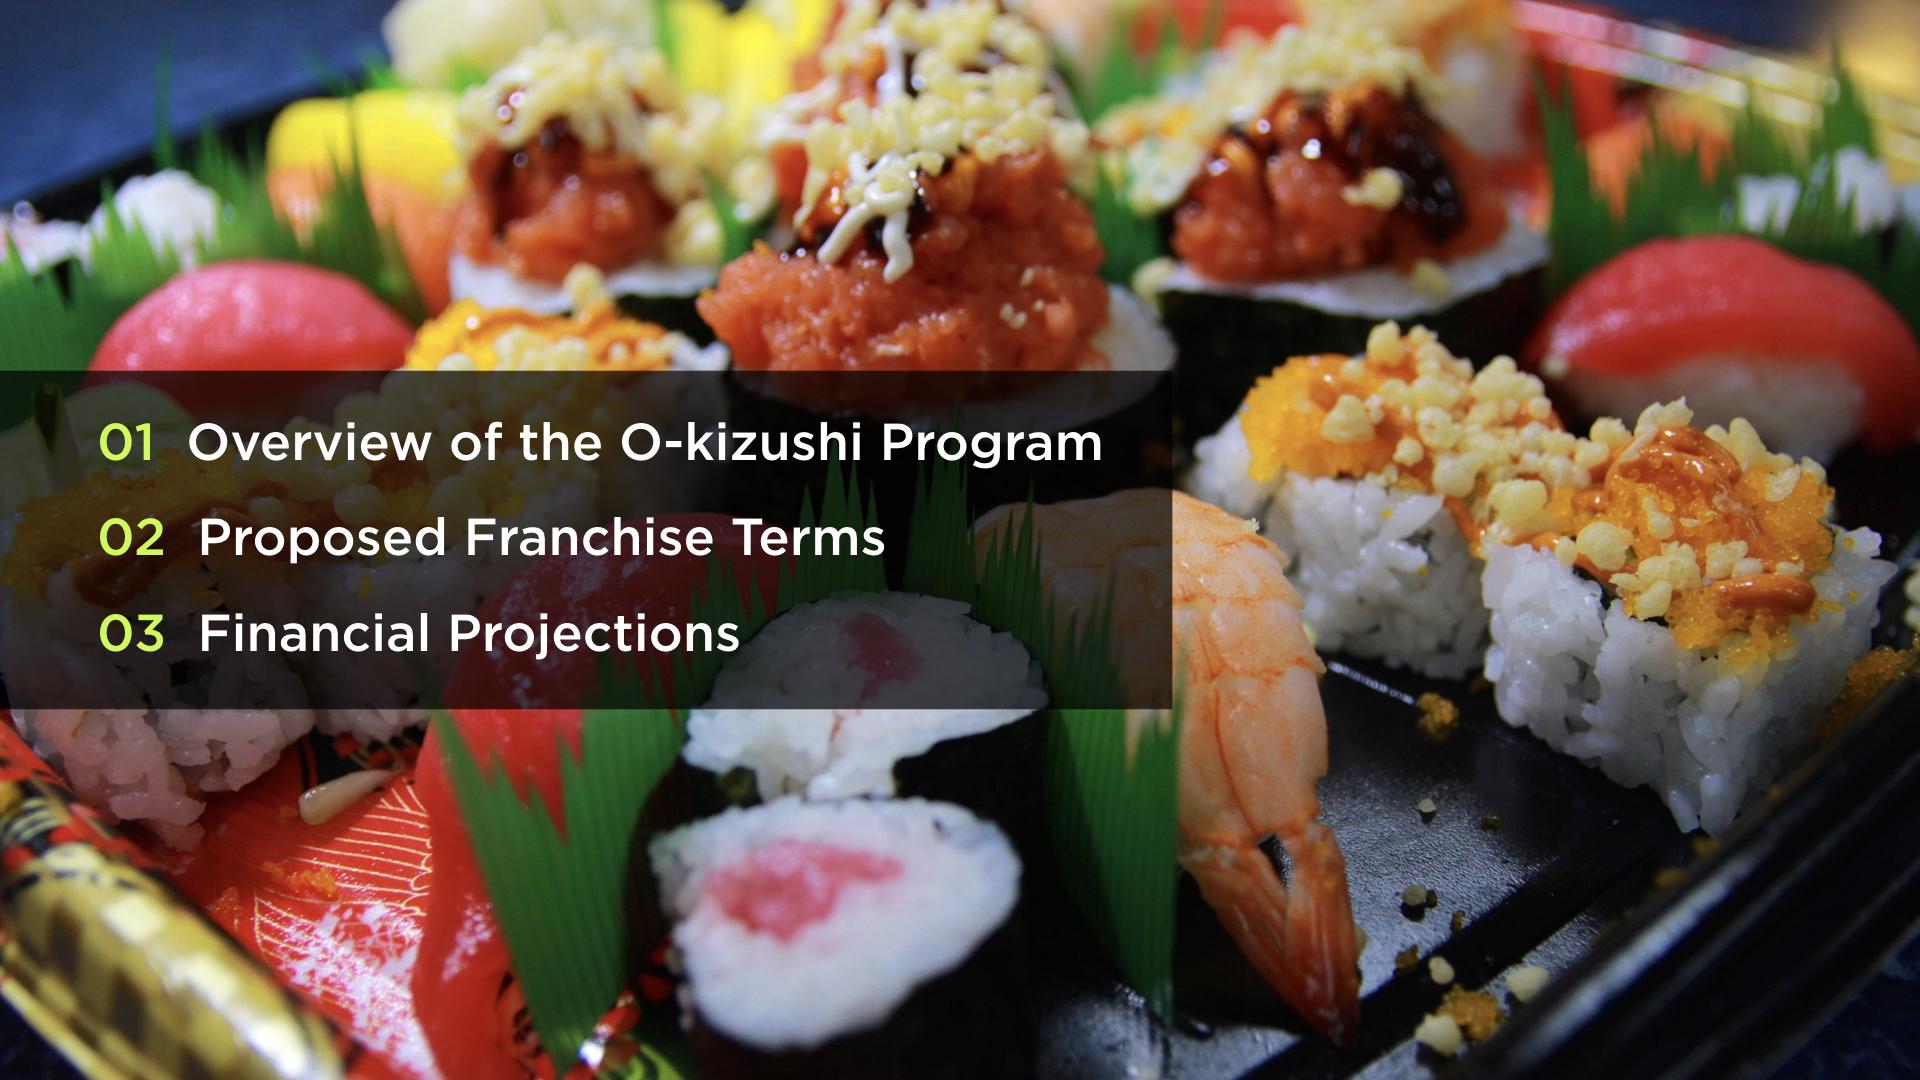 o-kizushi-proposal-mccs02.002.jpeg